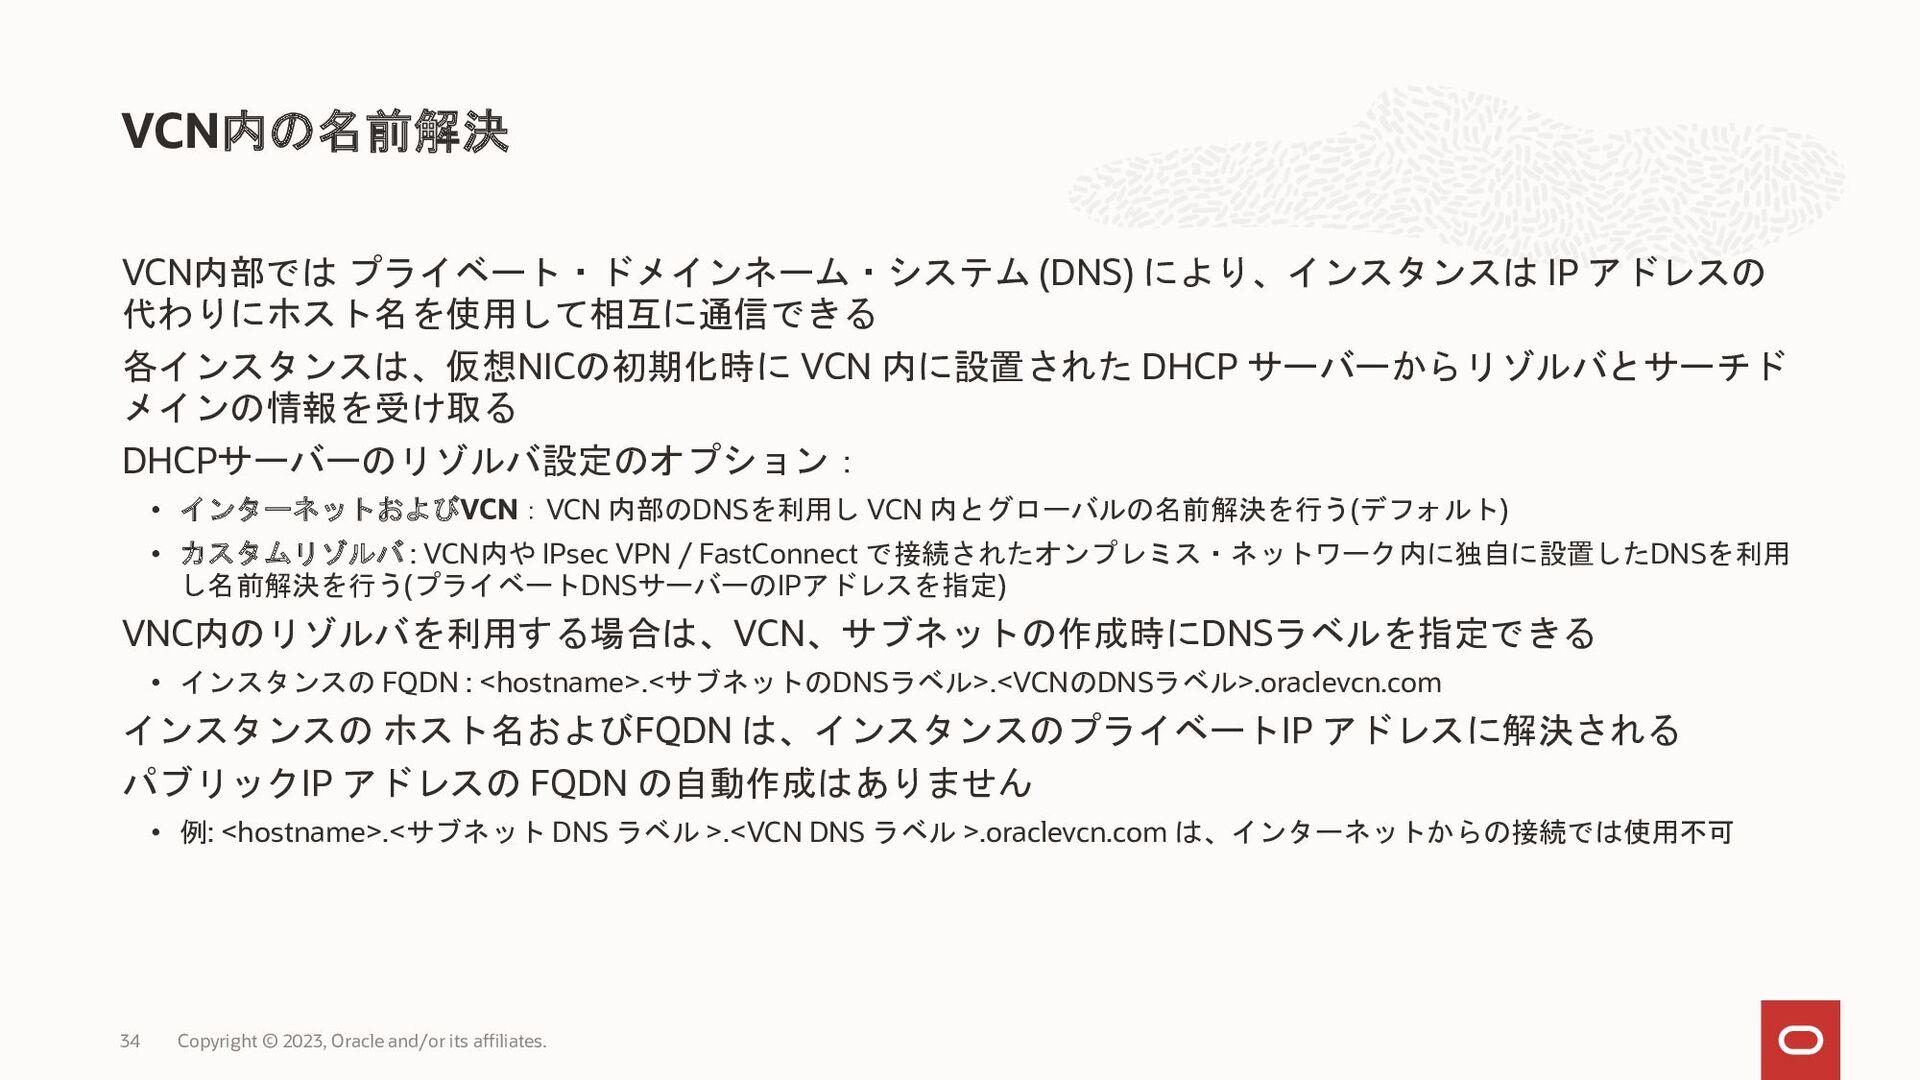 2 1 VCN 10.0.0.0/16 A 10.0.1.0/24 B 10.0.2.0/24...